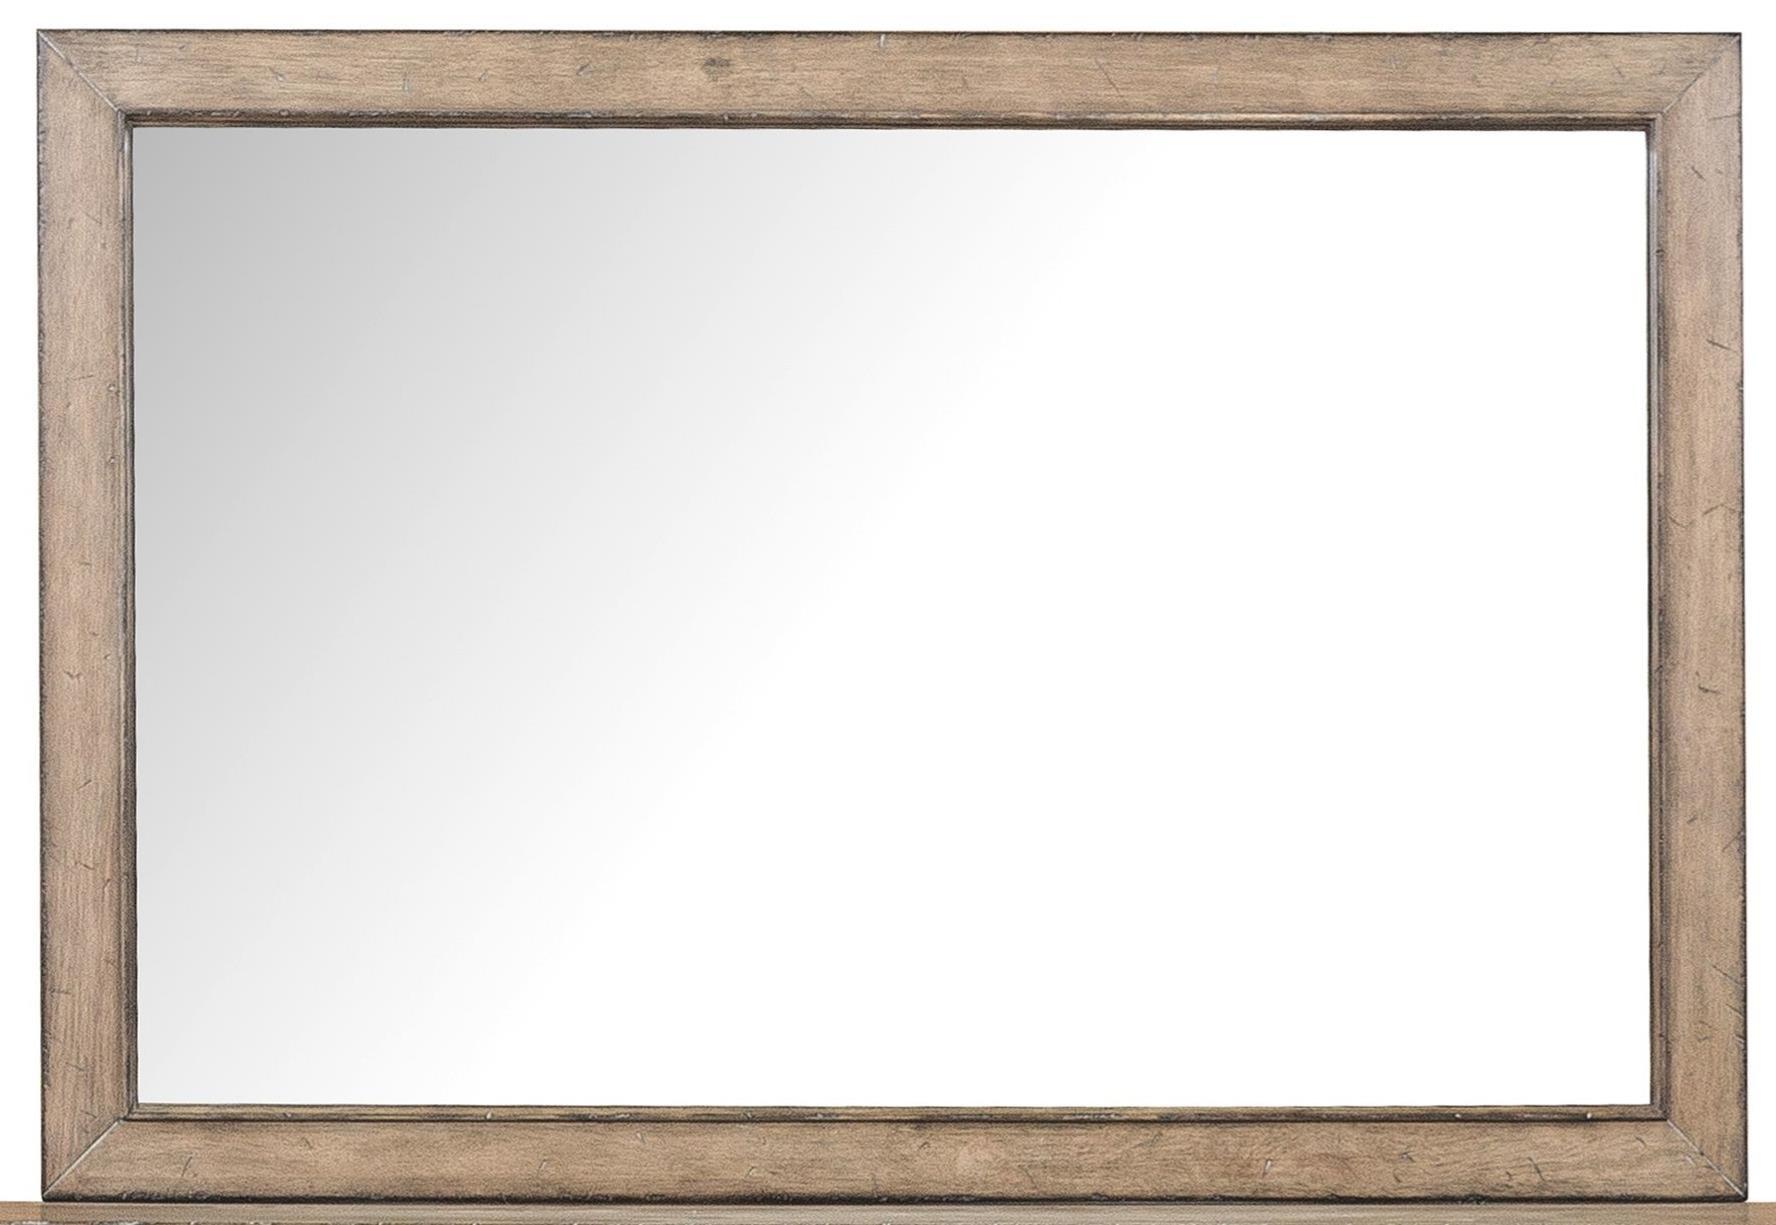 Samuel lawrence flatbush bureau beveled mirror royal for Bureau with mirror